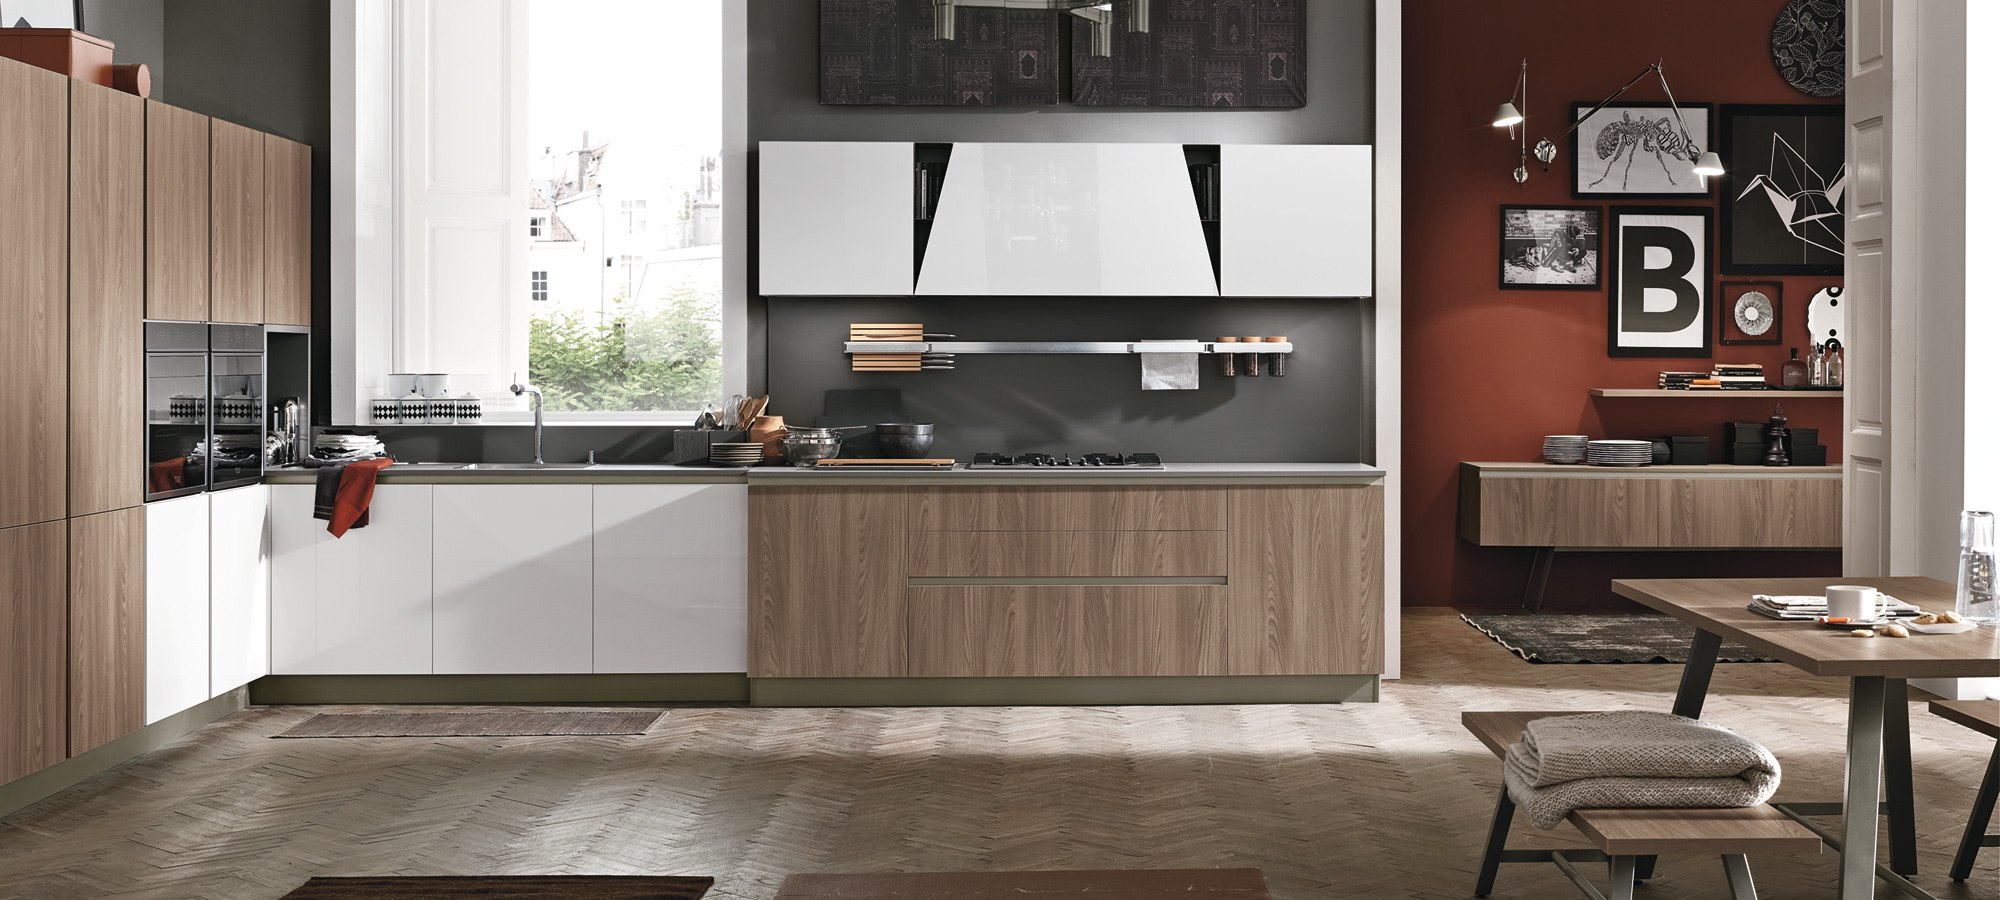 Cucina stosa infinity lorenzelli arredamenti - Prezzo cucina stosa ...